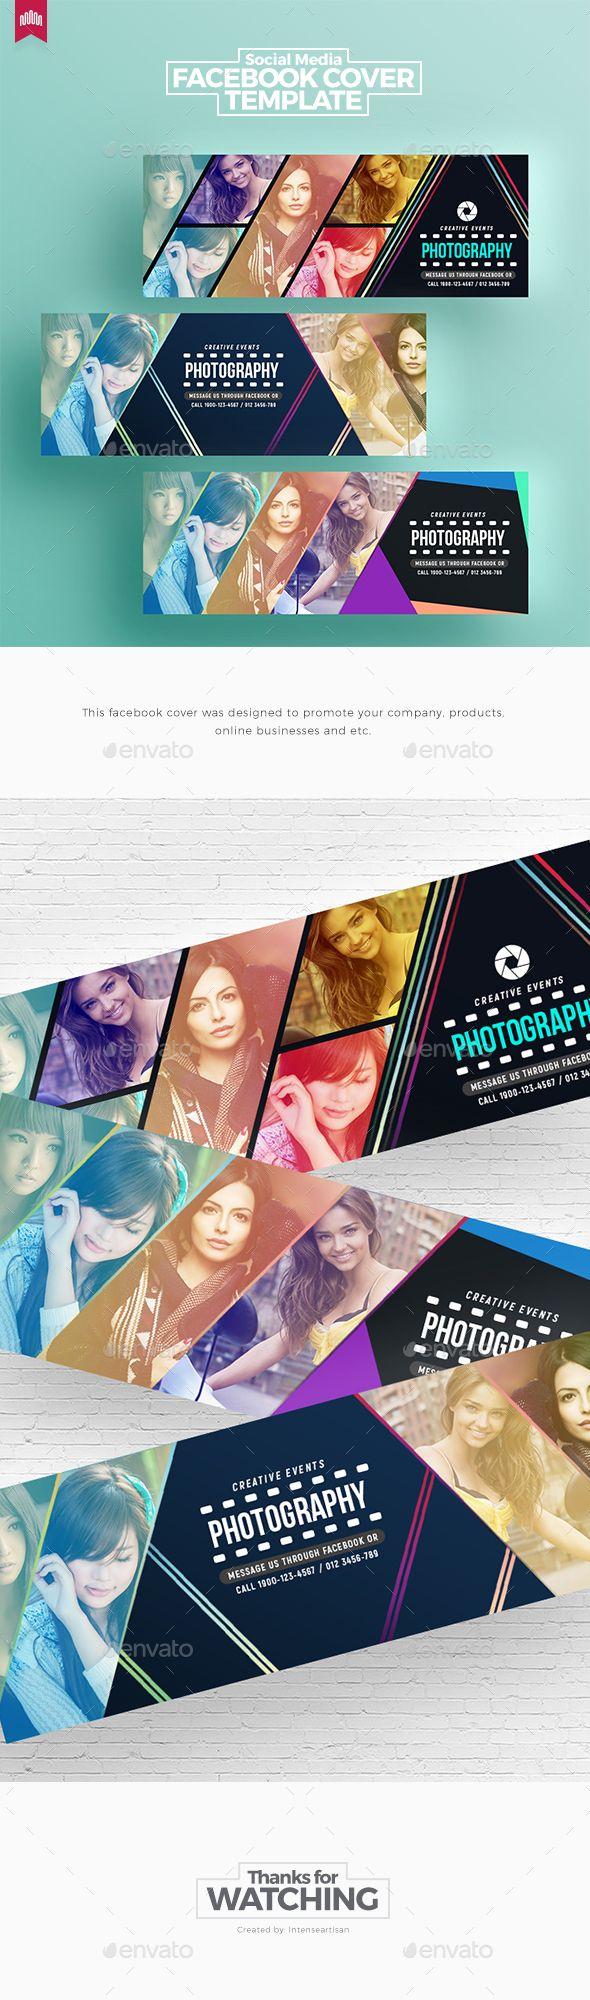 Creative Facebook Timeline Covers - Facebook Timeline Covers #Social #Media Download here: https://graphicriver.net/item/creative-facebook-timeline-covers/19995775?ref=alena994